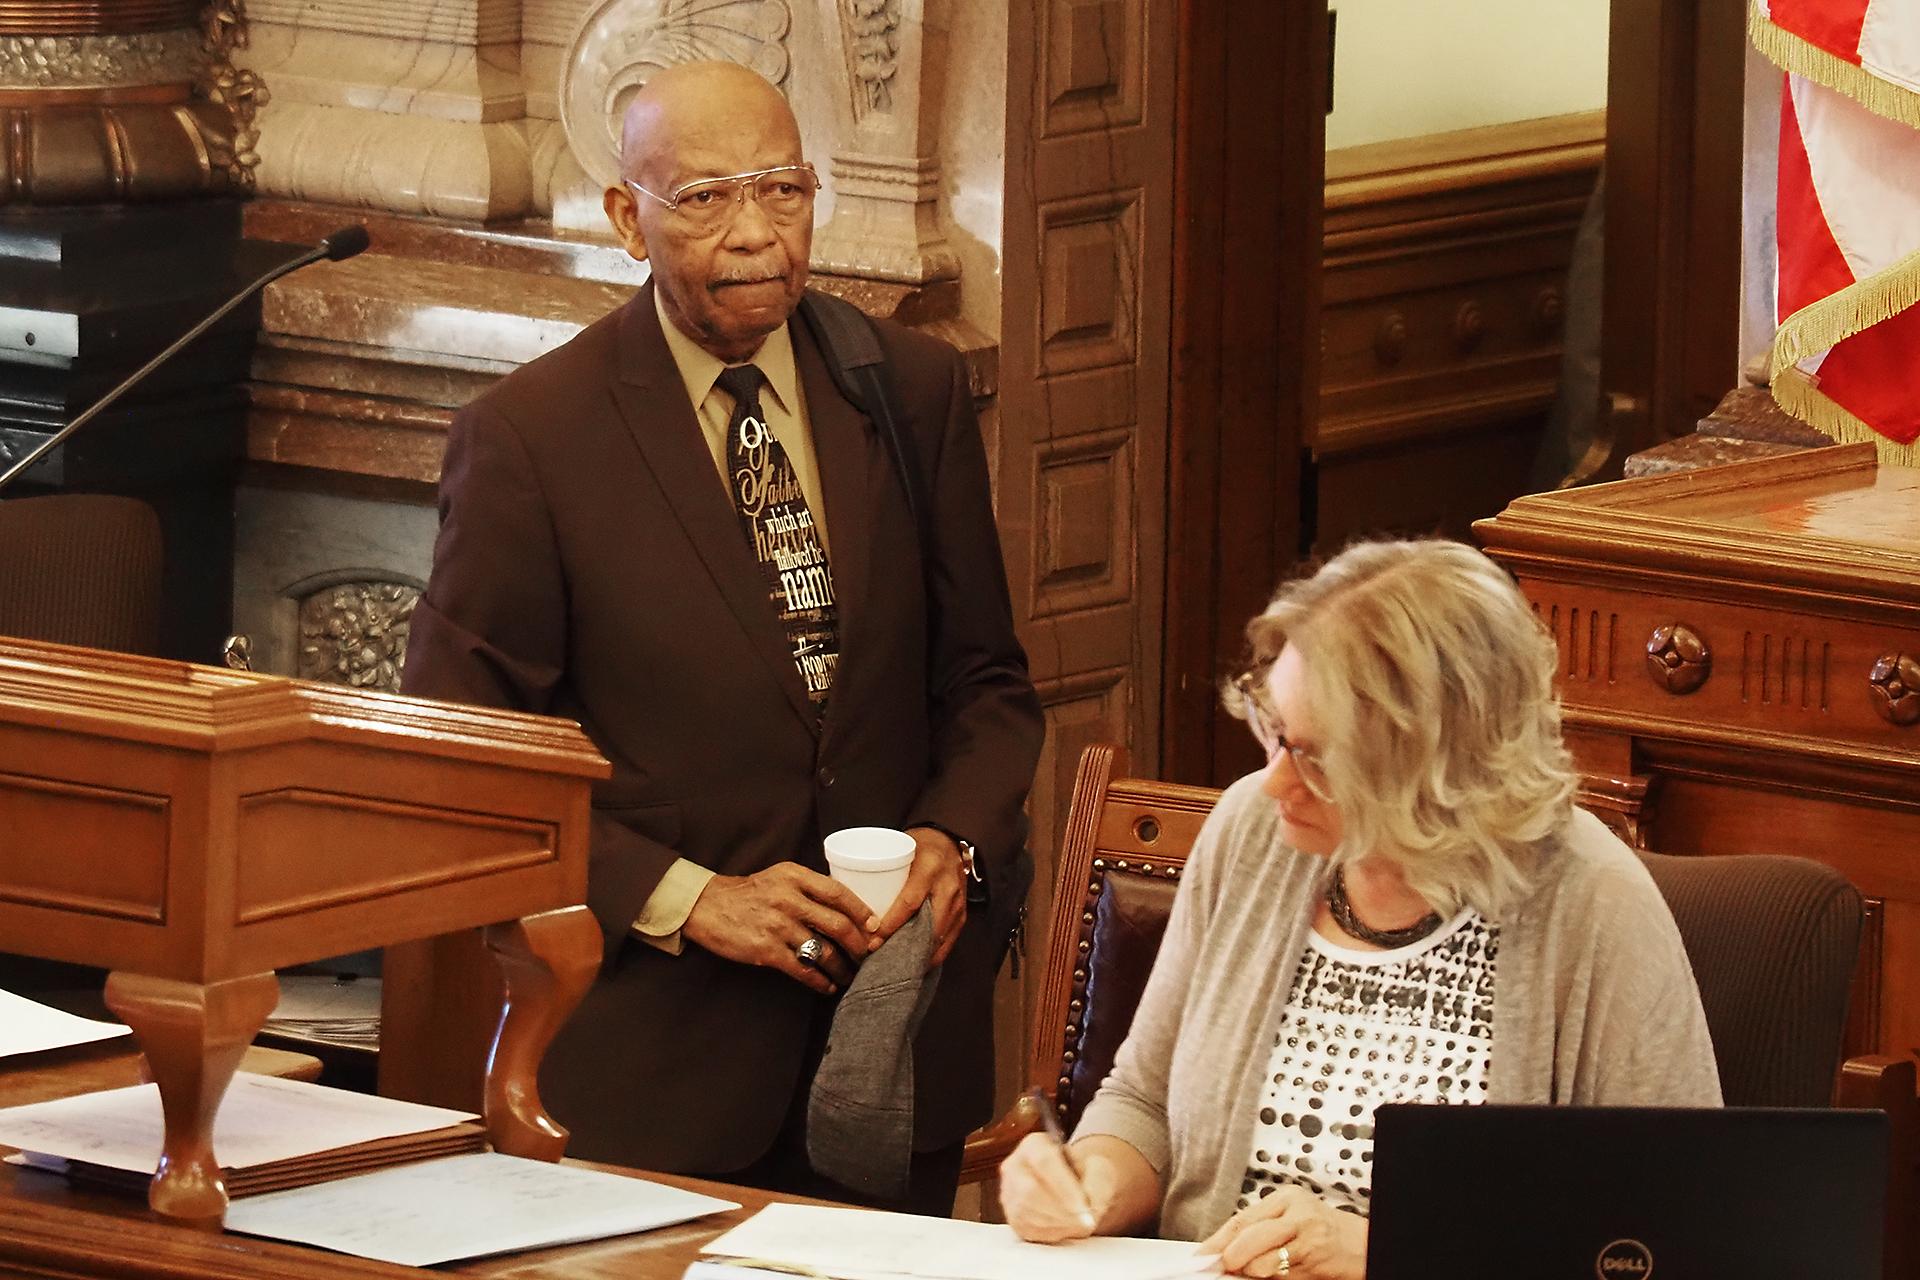 The Rev. Cecil Washington, who regularly delivers opening prayers in the Kansas Senate, urged senators to consider